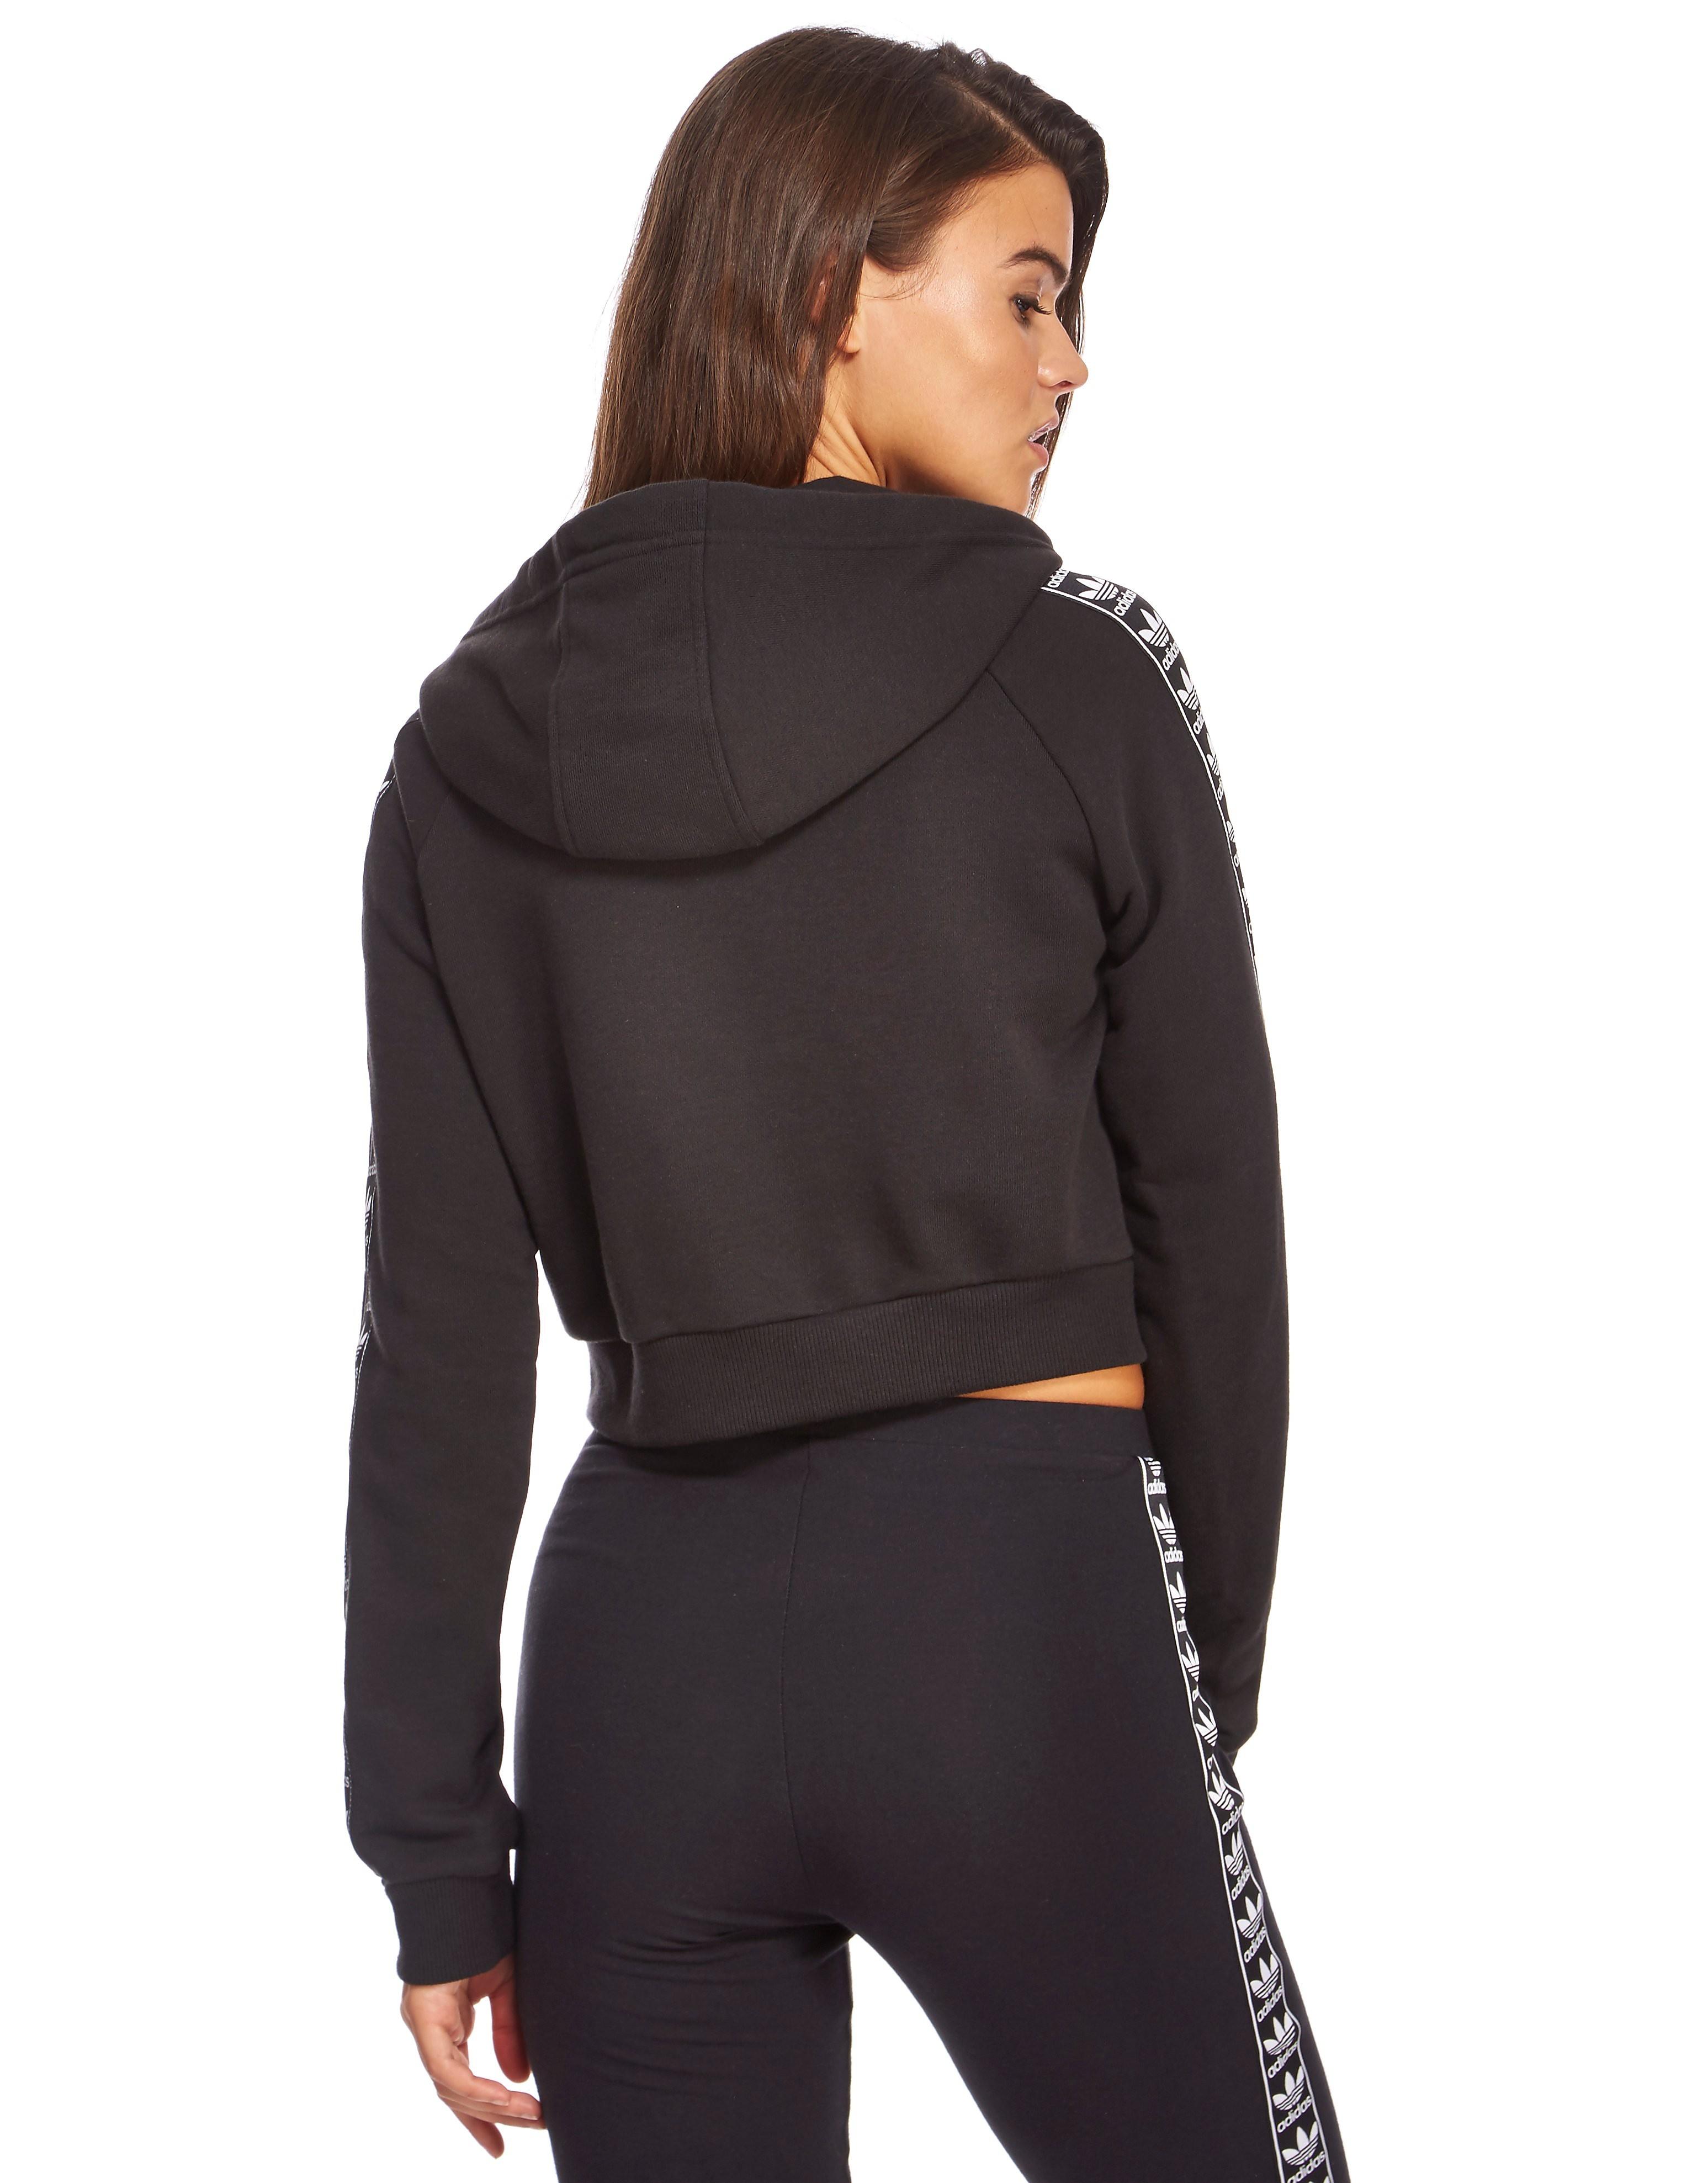 adidas Originals Tape Crop Overhead hoodie